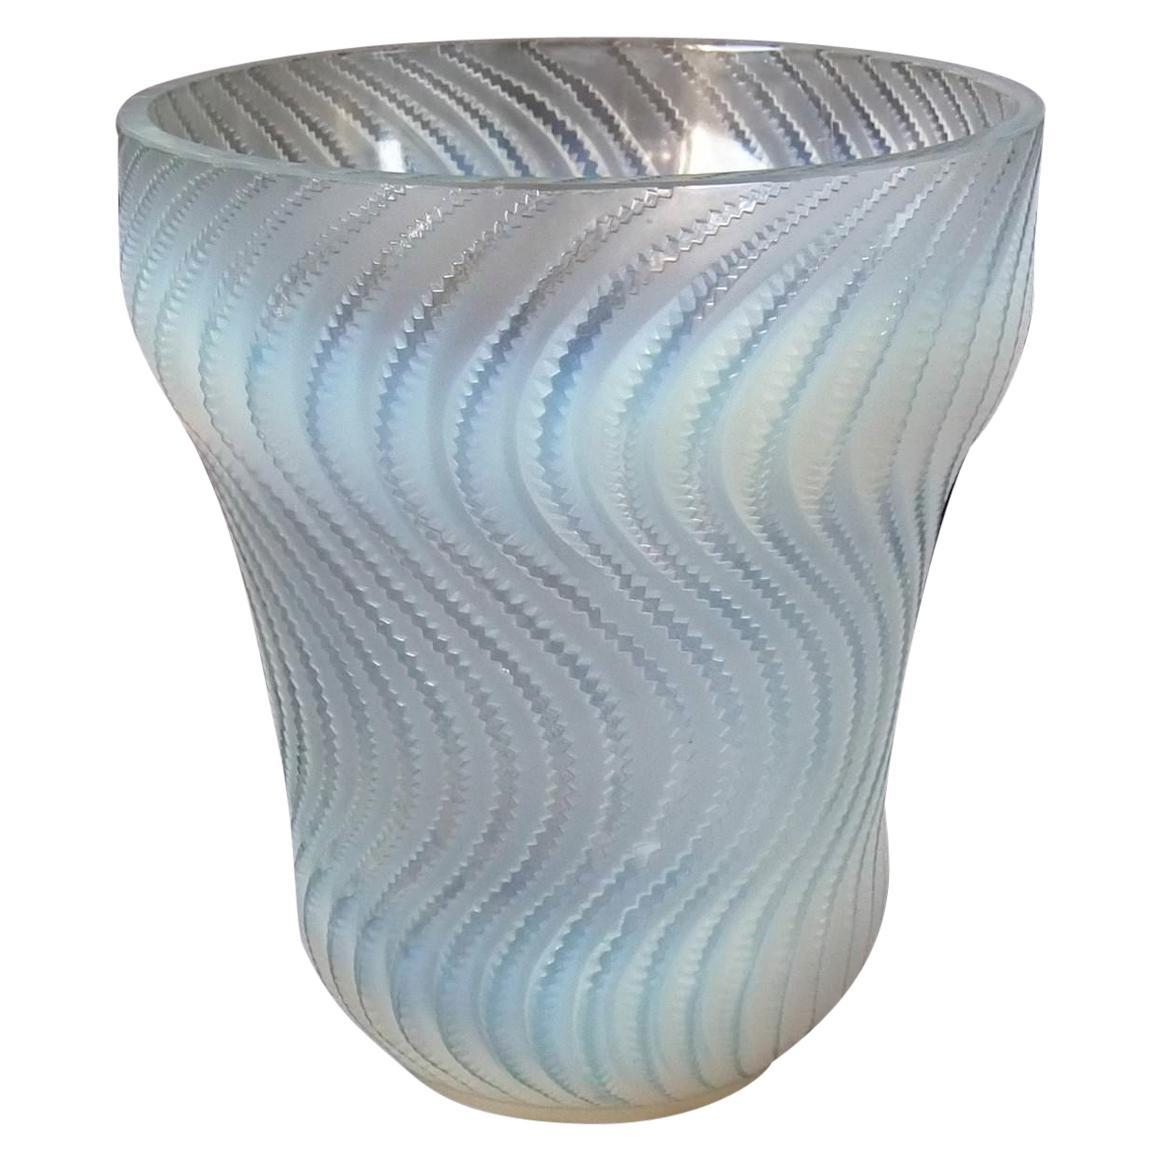 René Lalique Opalescent Glass 'Actinia' Vase